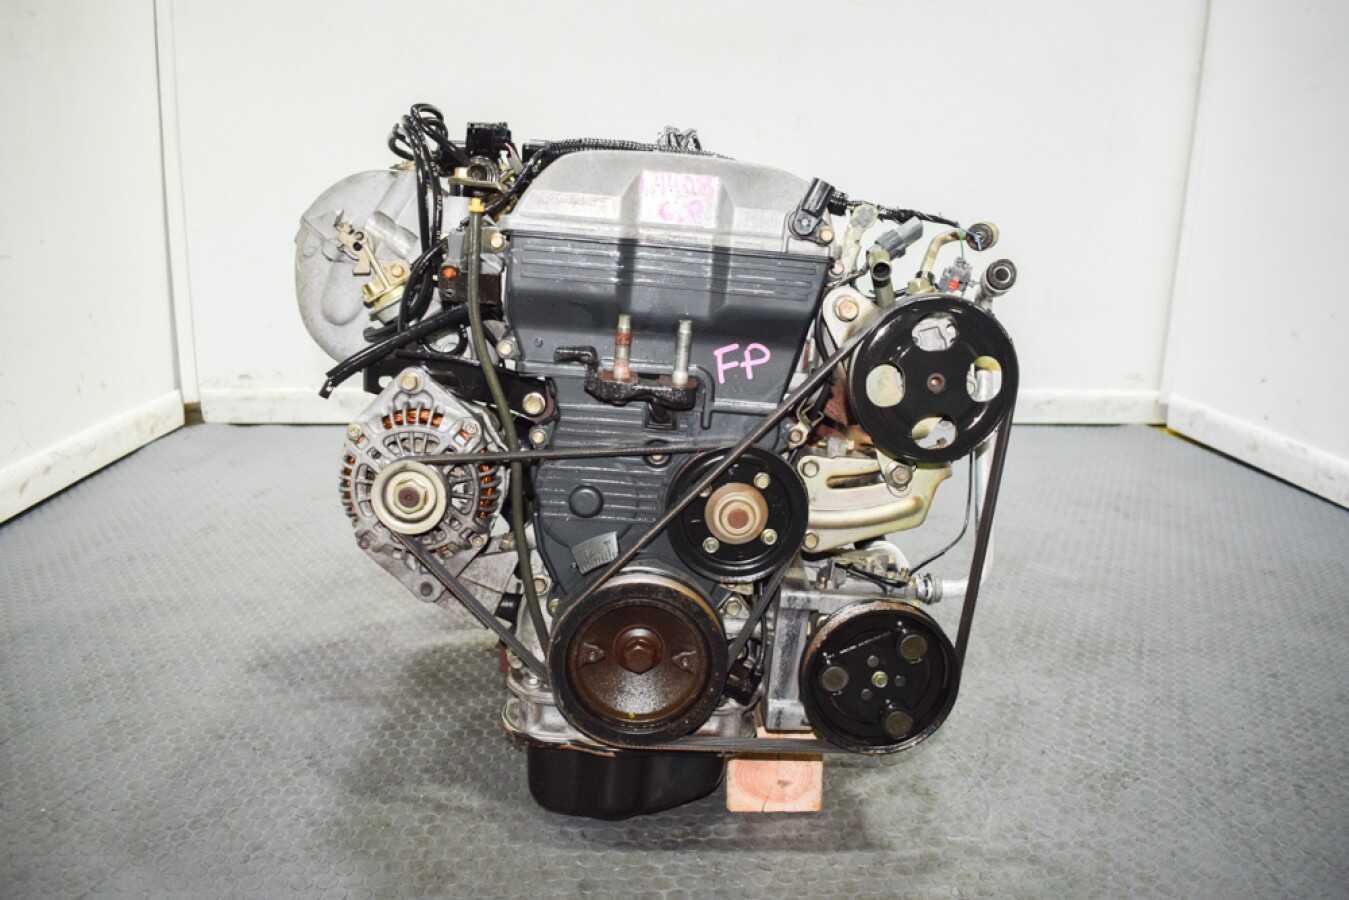 Used Low Mileage Jdm 99 00 Mazda Protege 1 8 Liter Fp Engine For Sale Mazda Protege 1999 2003 2 0l Fs Engine J Spec Auto Sports